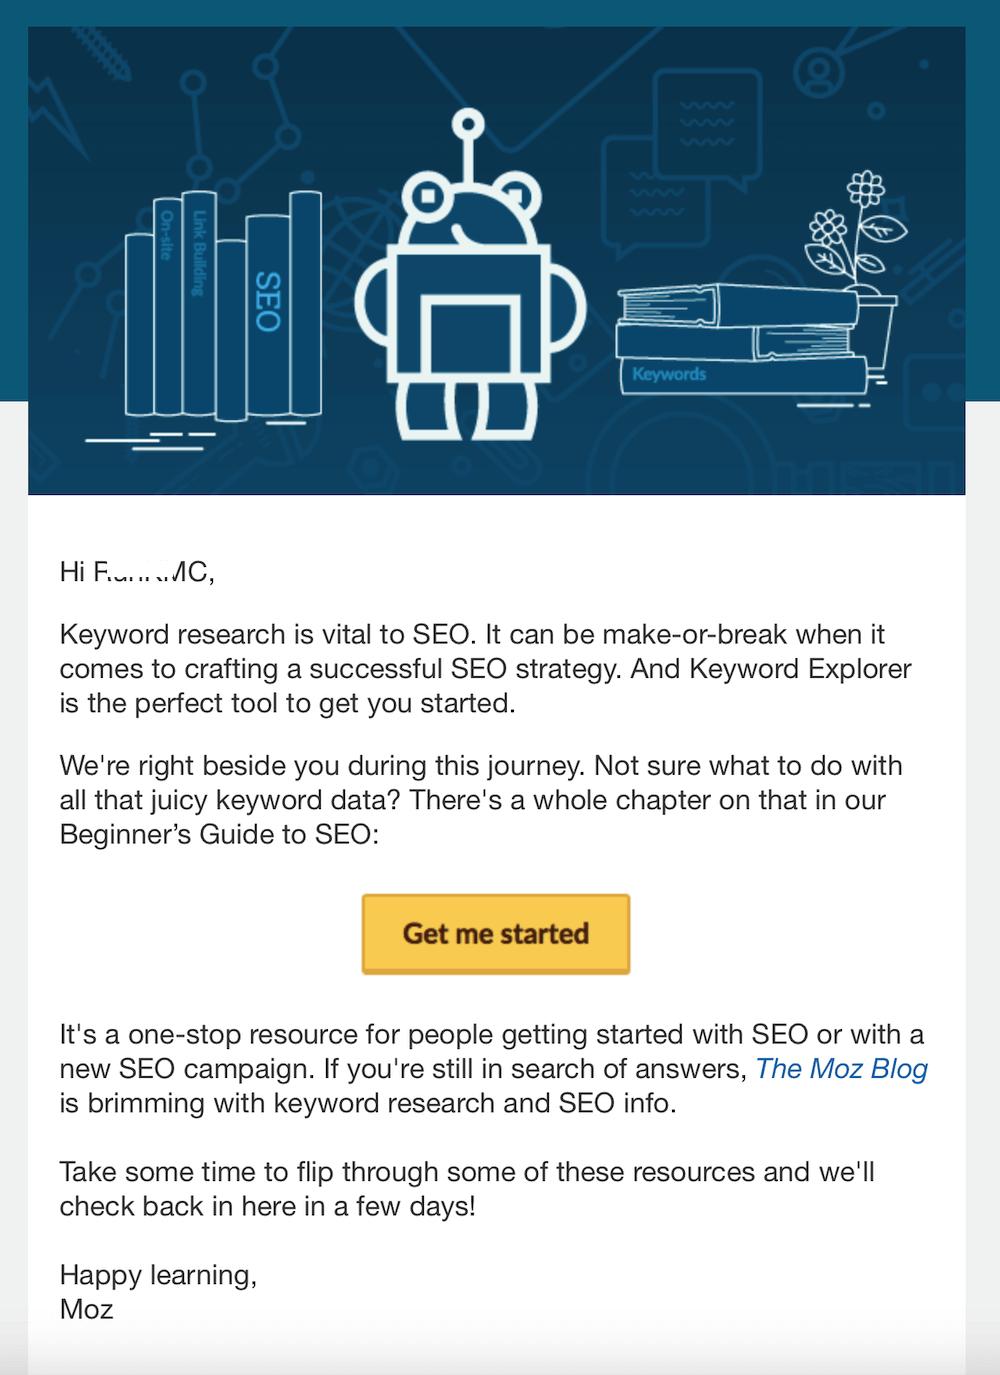 b2b marketing strategies example of a nurture email